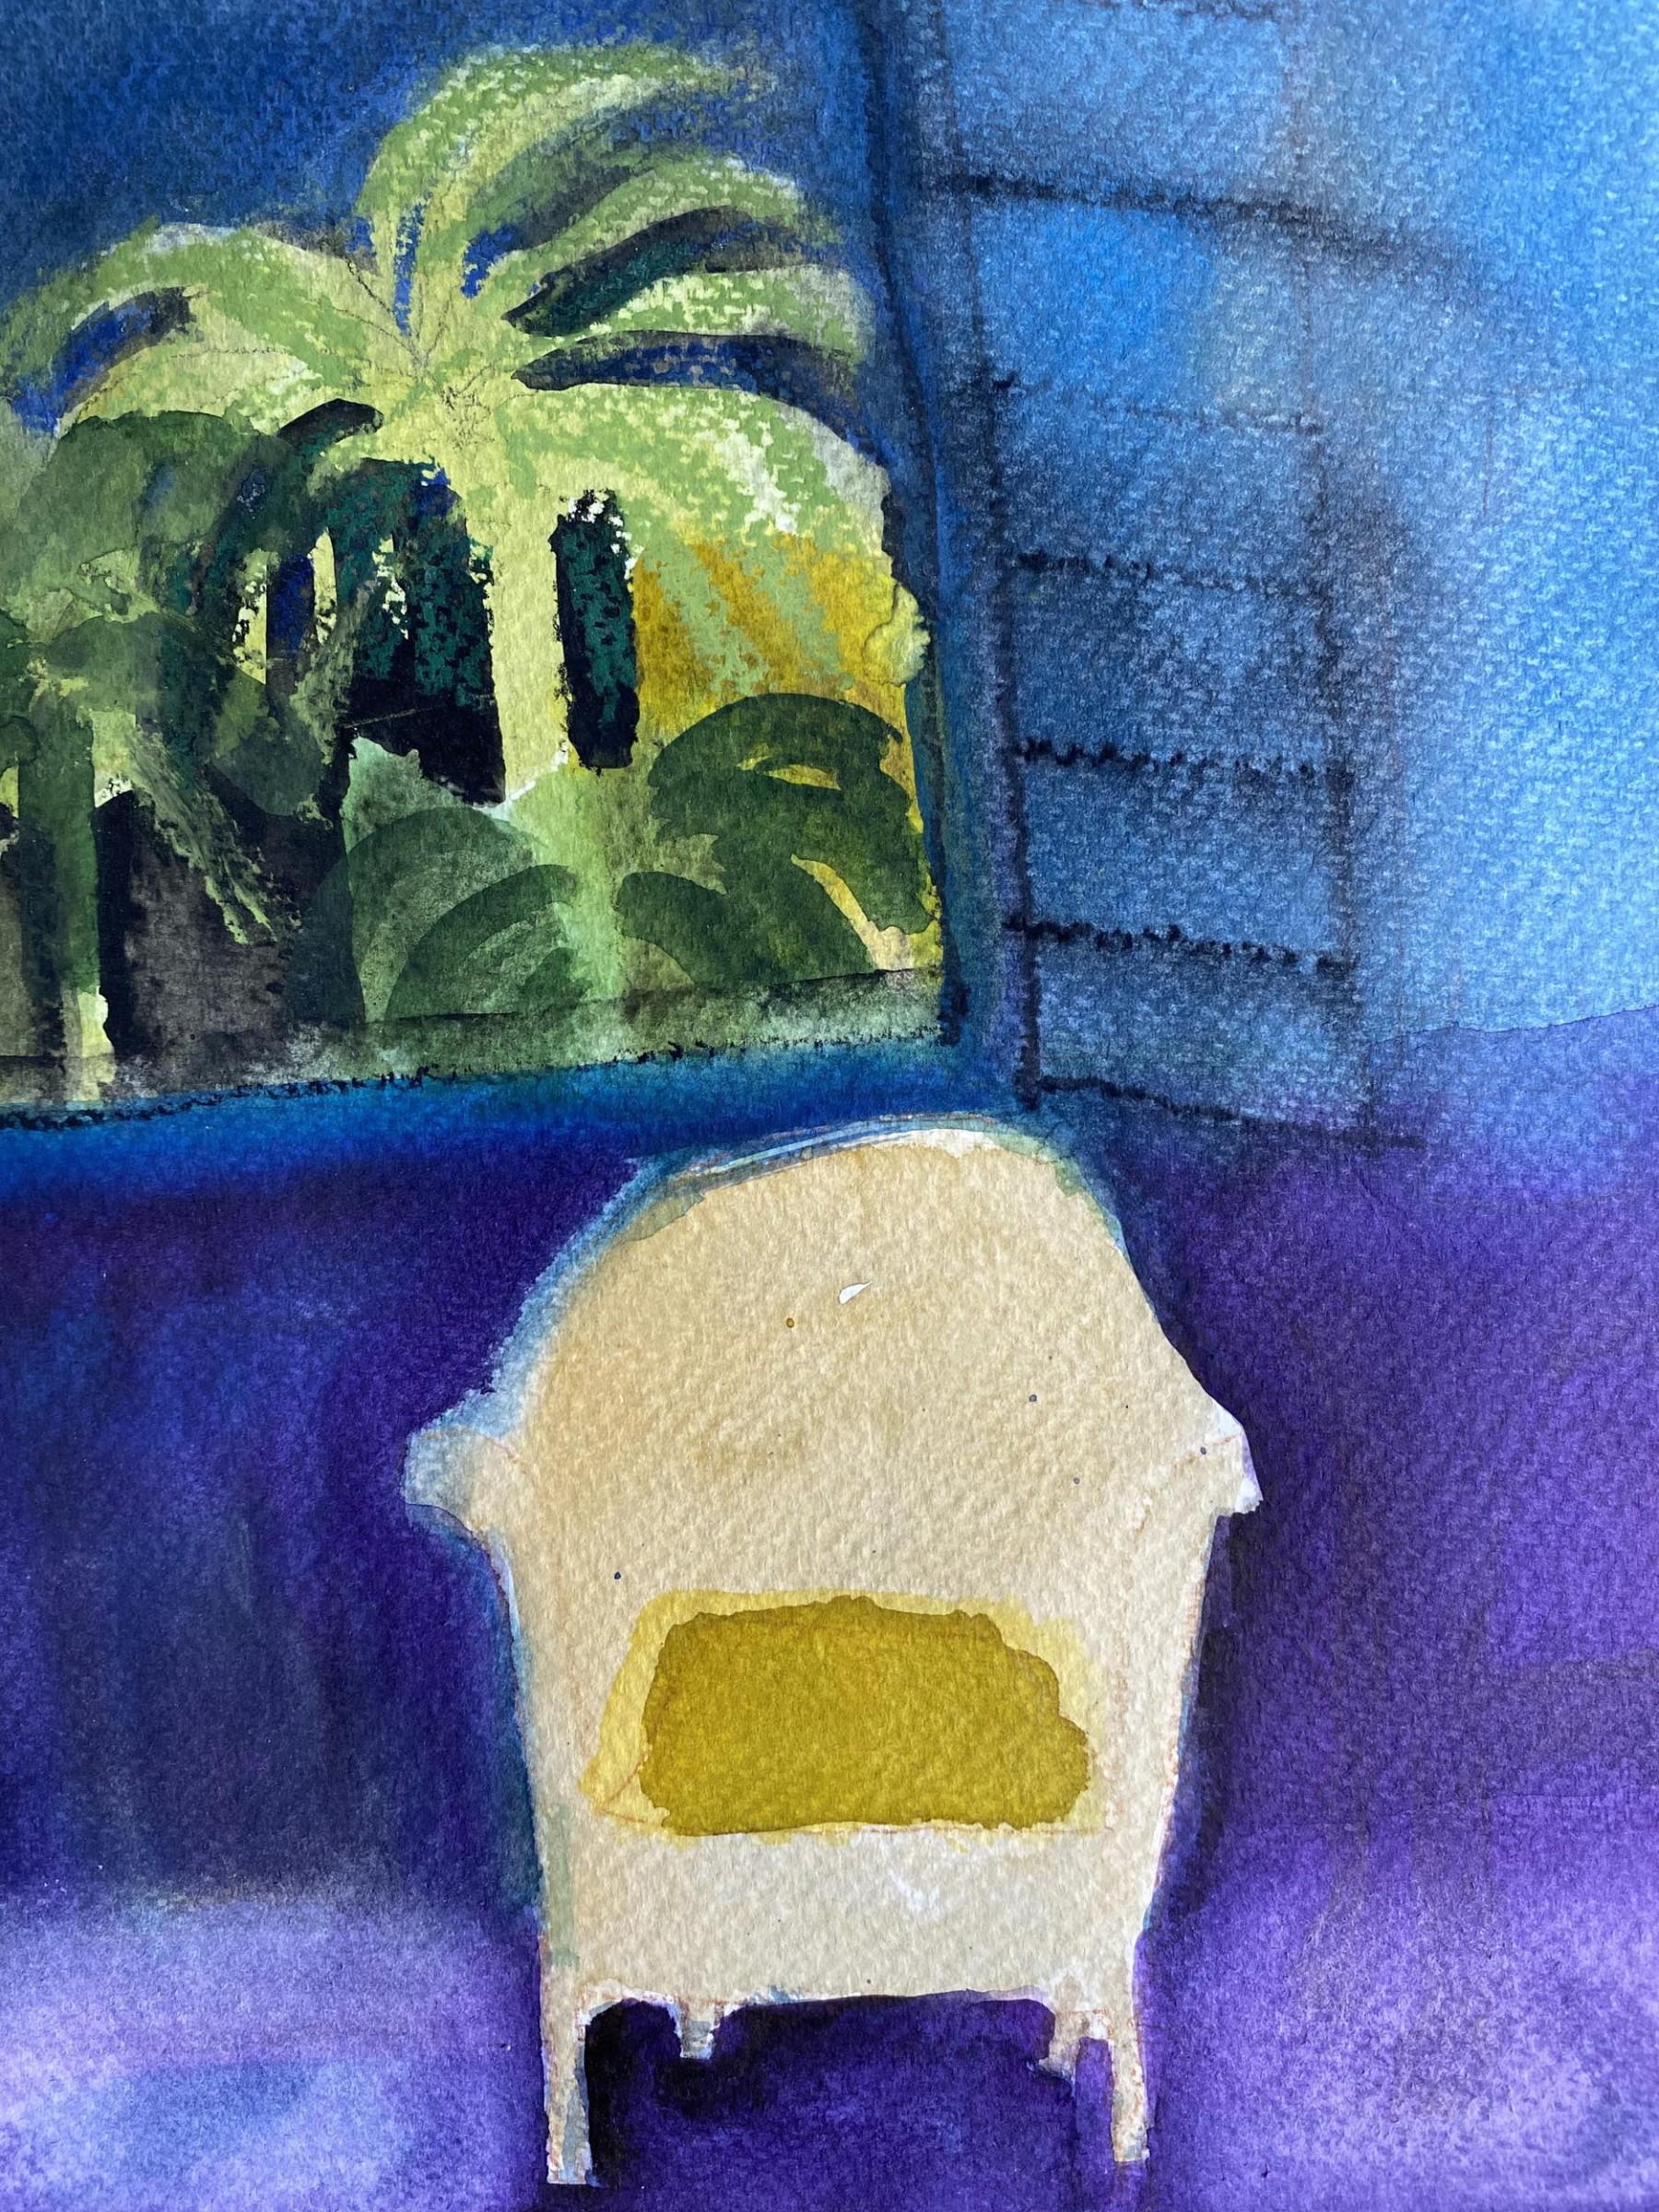 "<span class=""link fancybox-details-link""><a href=""/exhibitions/39/works/artworks_standalone12396/"">View Detail Page</a></span><div class=""medium"">watercolour on paper</div><div class=""dimensions"">Frame: 38 x 30 cm<br /> Artwork: 29 x 20 cm</div>"